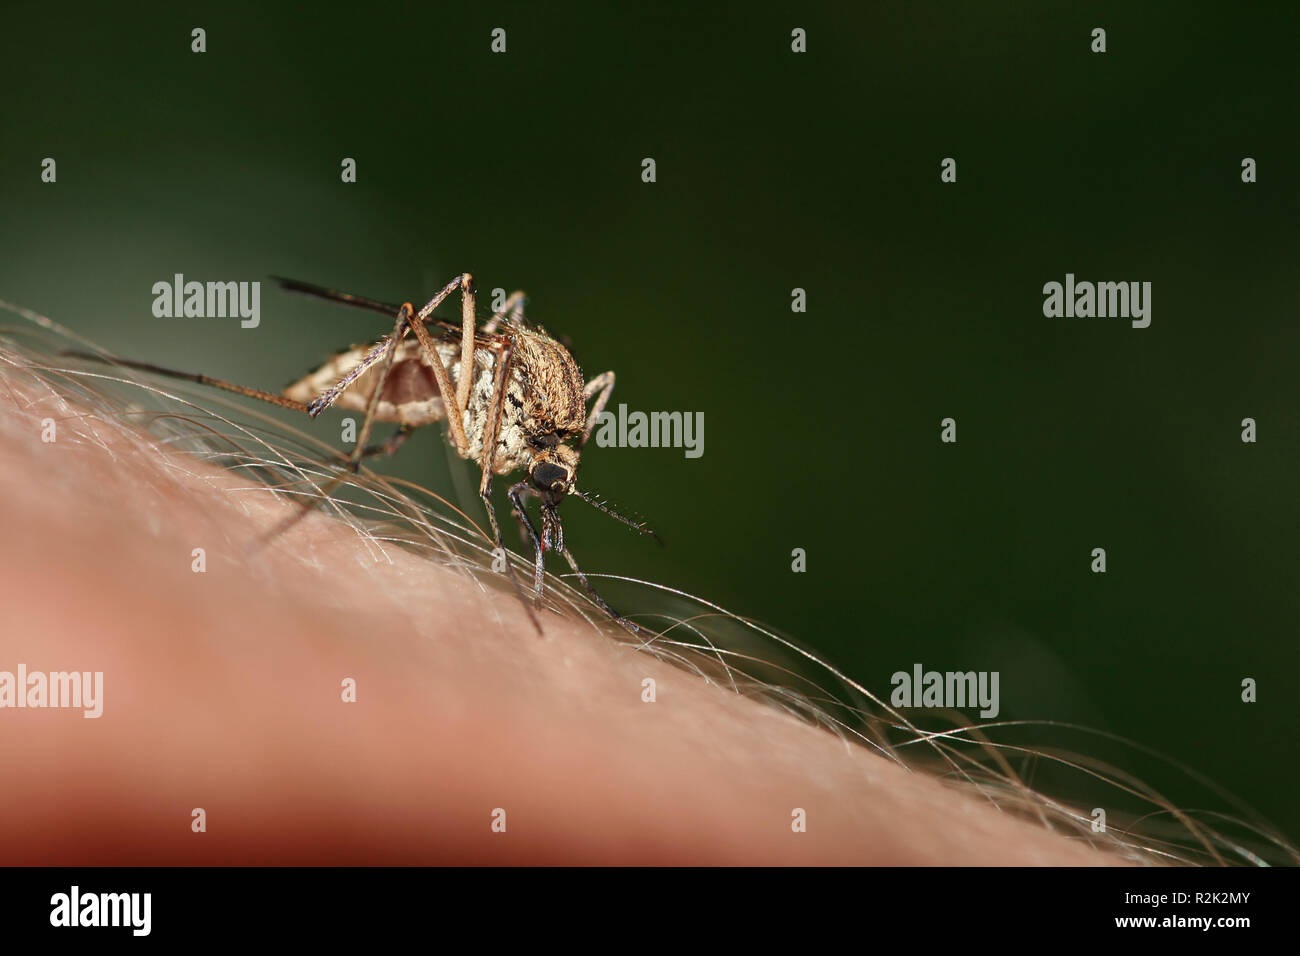 mosquito bite i Stock Photo